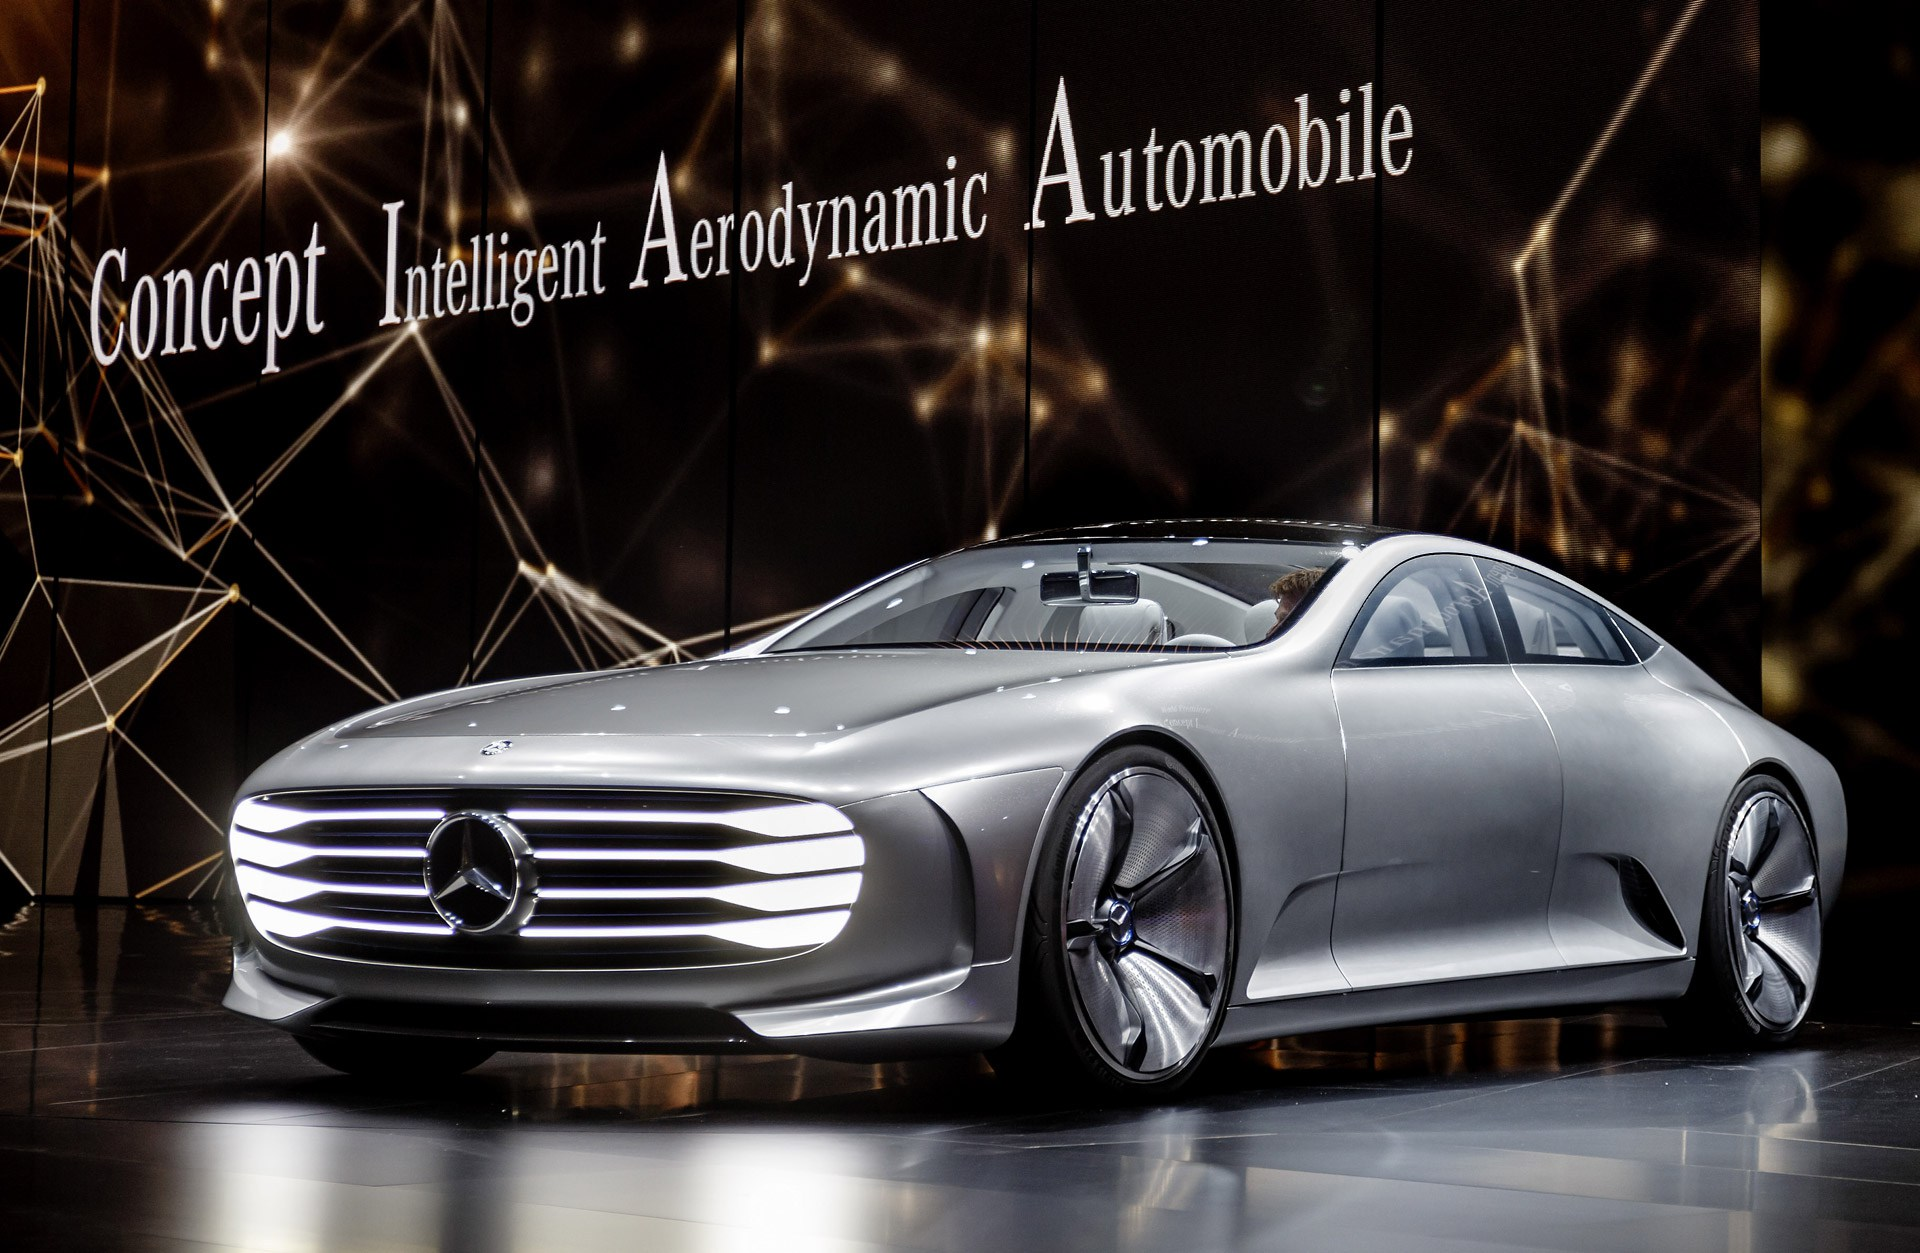 Concept Intelligent Aerodynamic Automobile